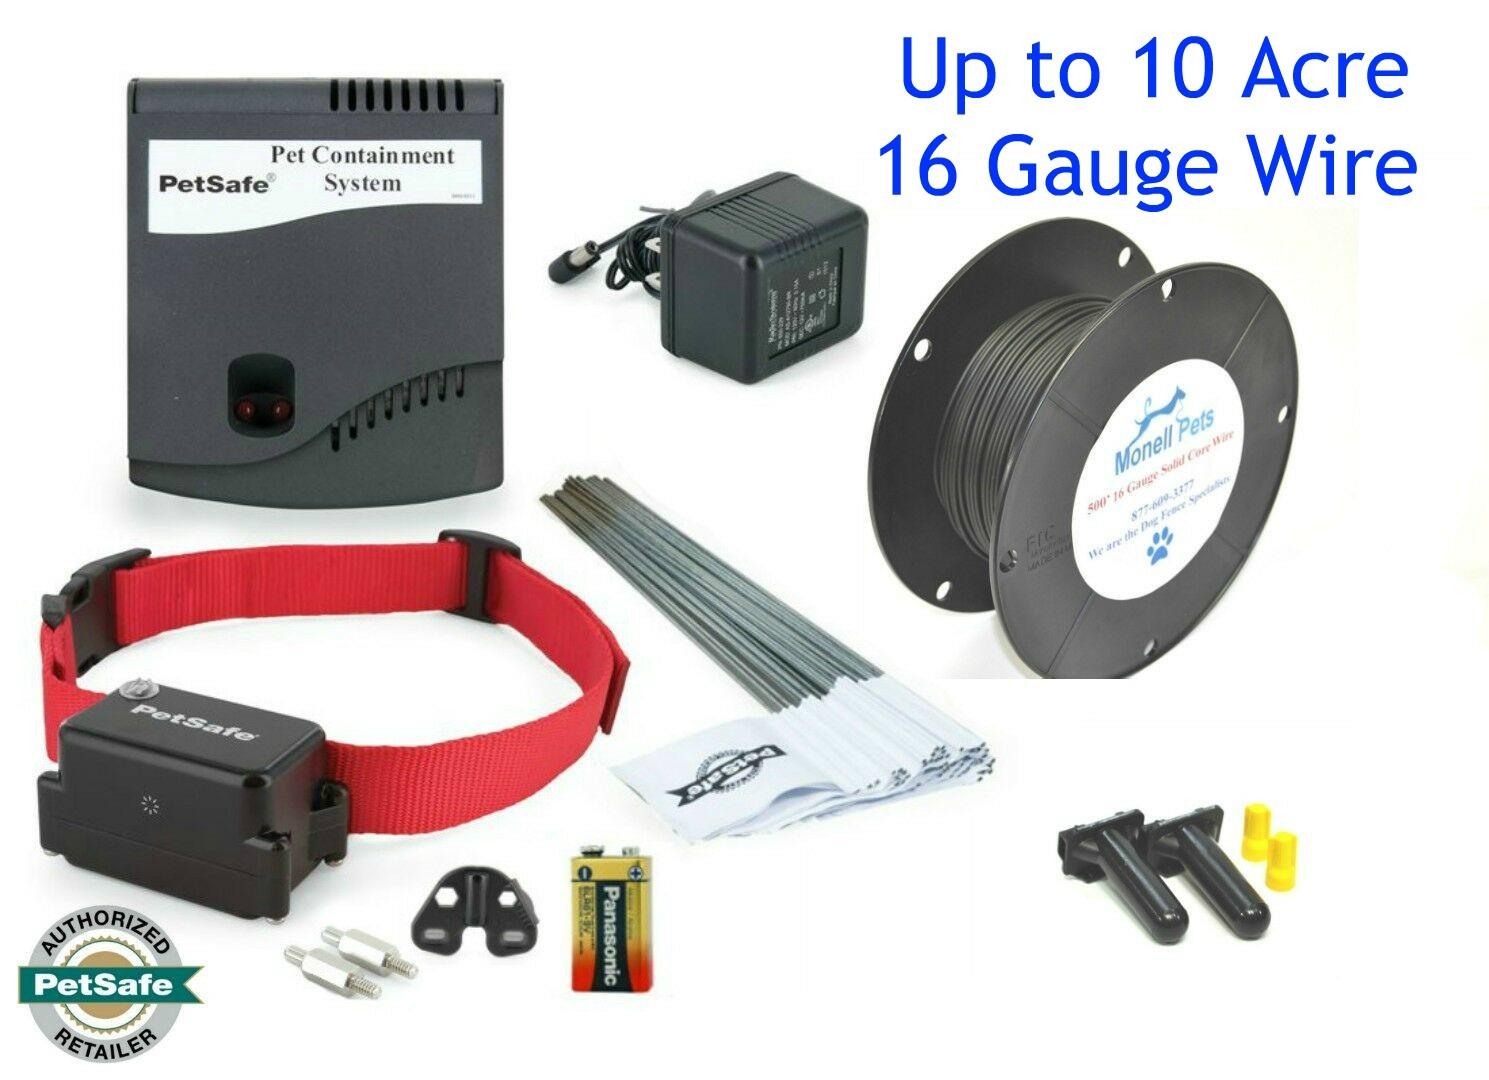 Petsafe Stubborn Dog Fence Kit 16 Gauge Solid Wire ZIG00-14658